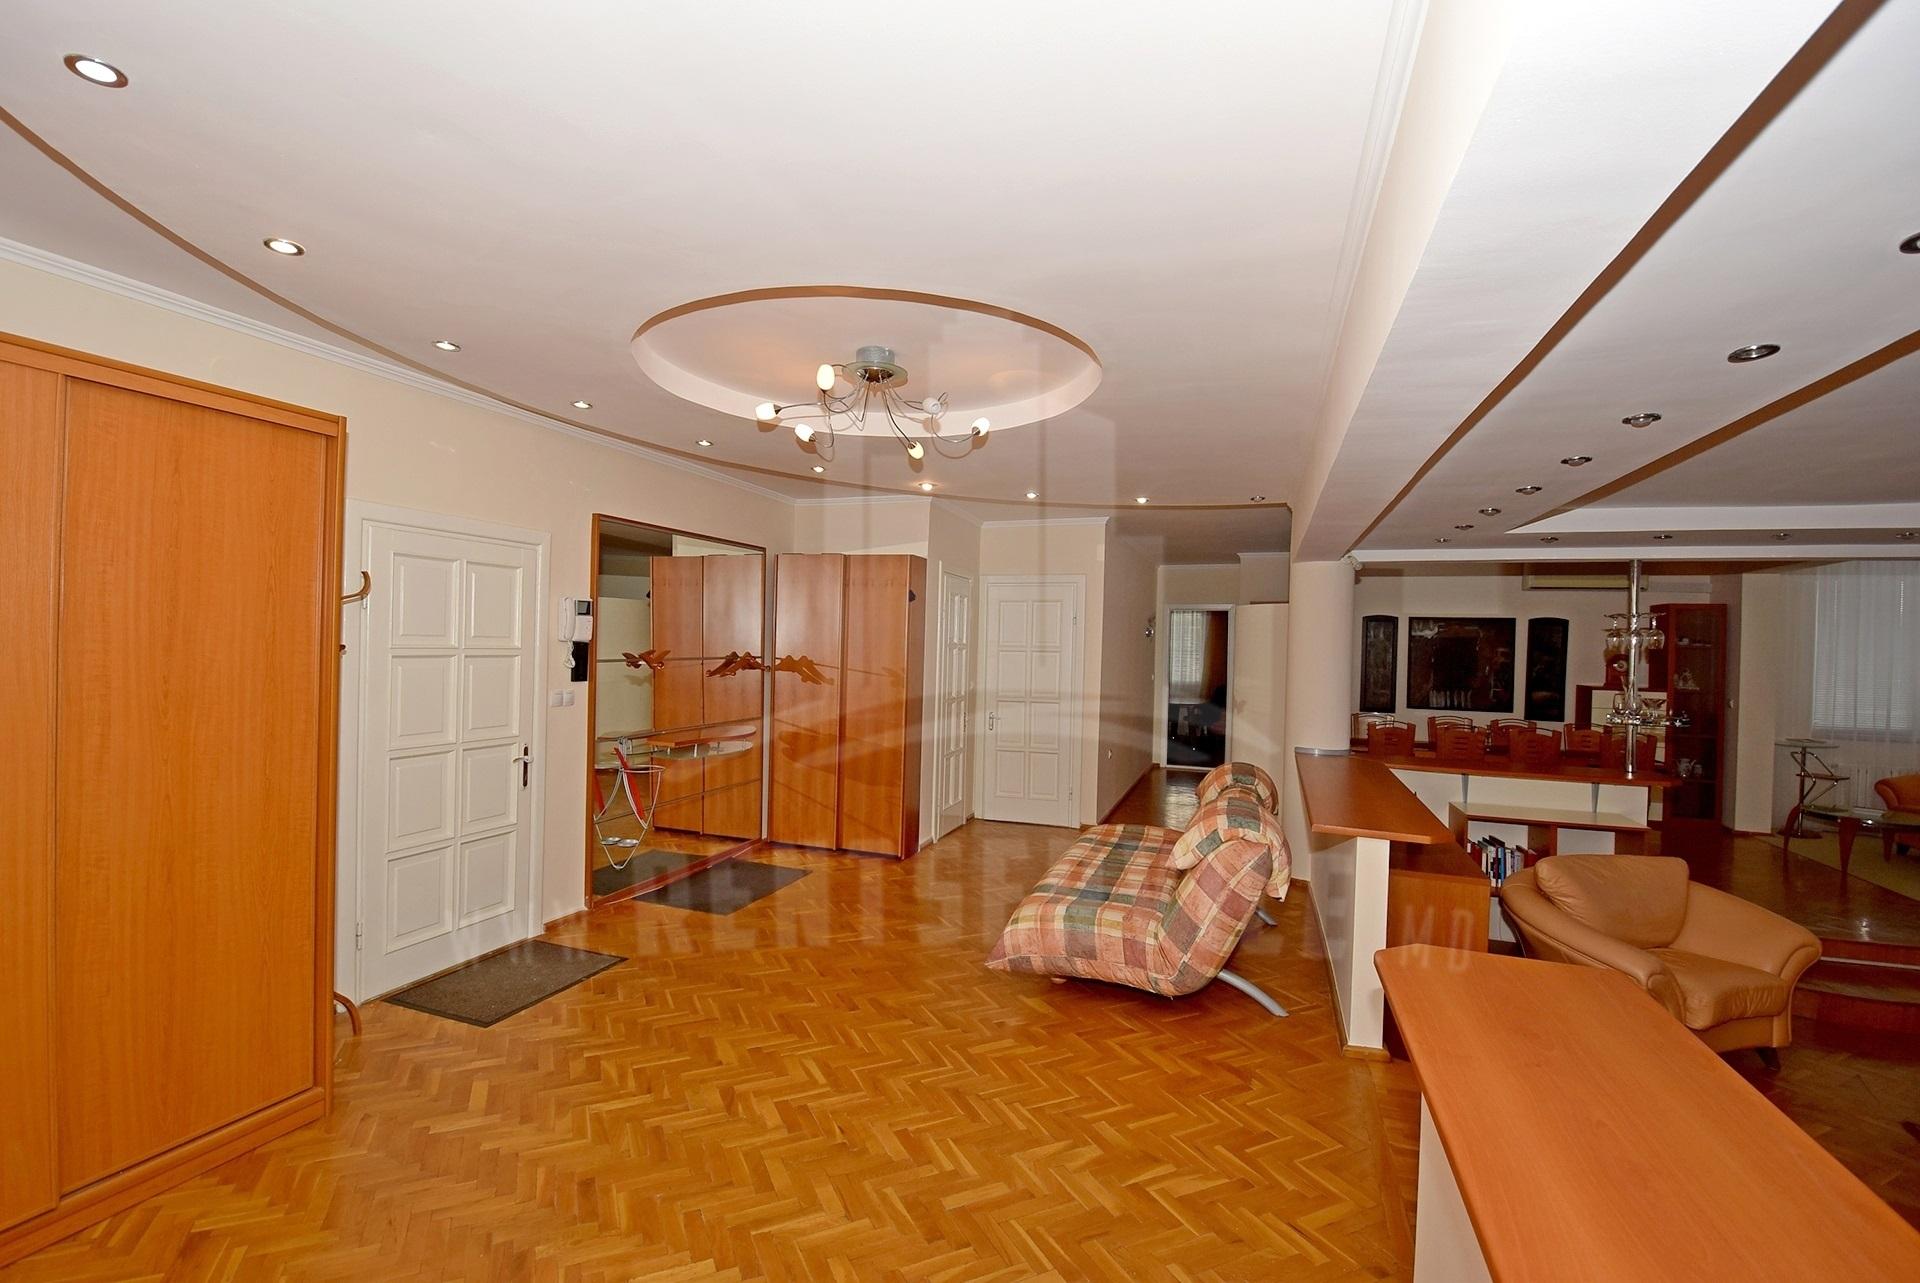 2064_apartment_19.jpg